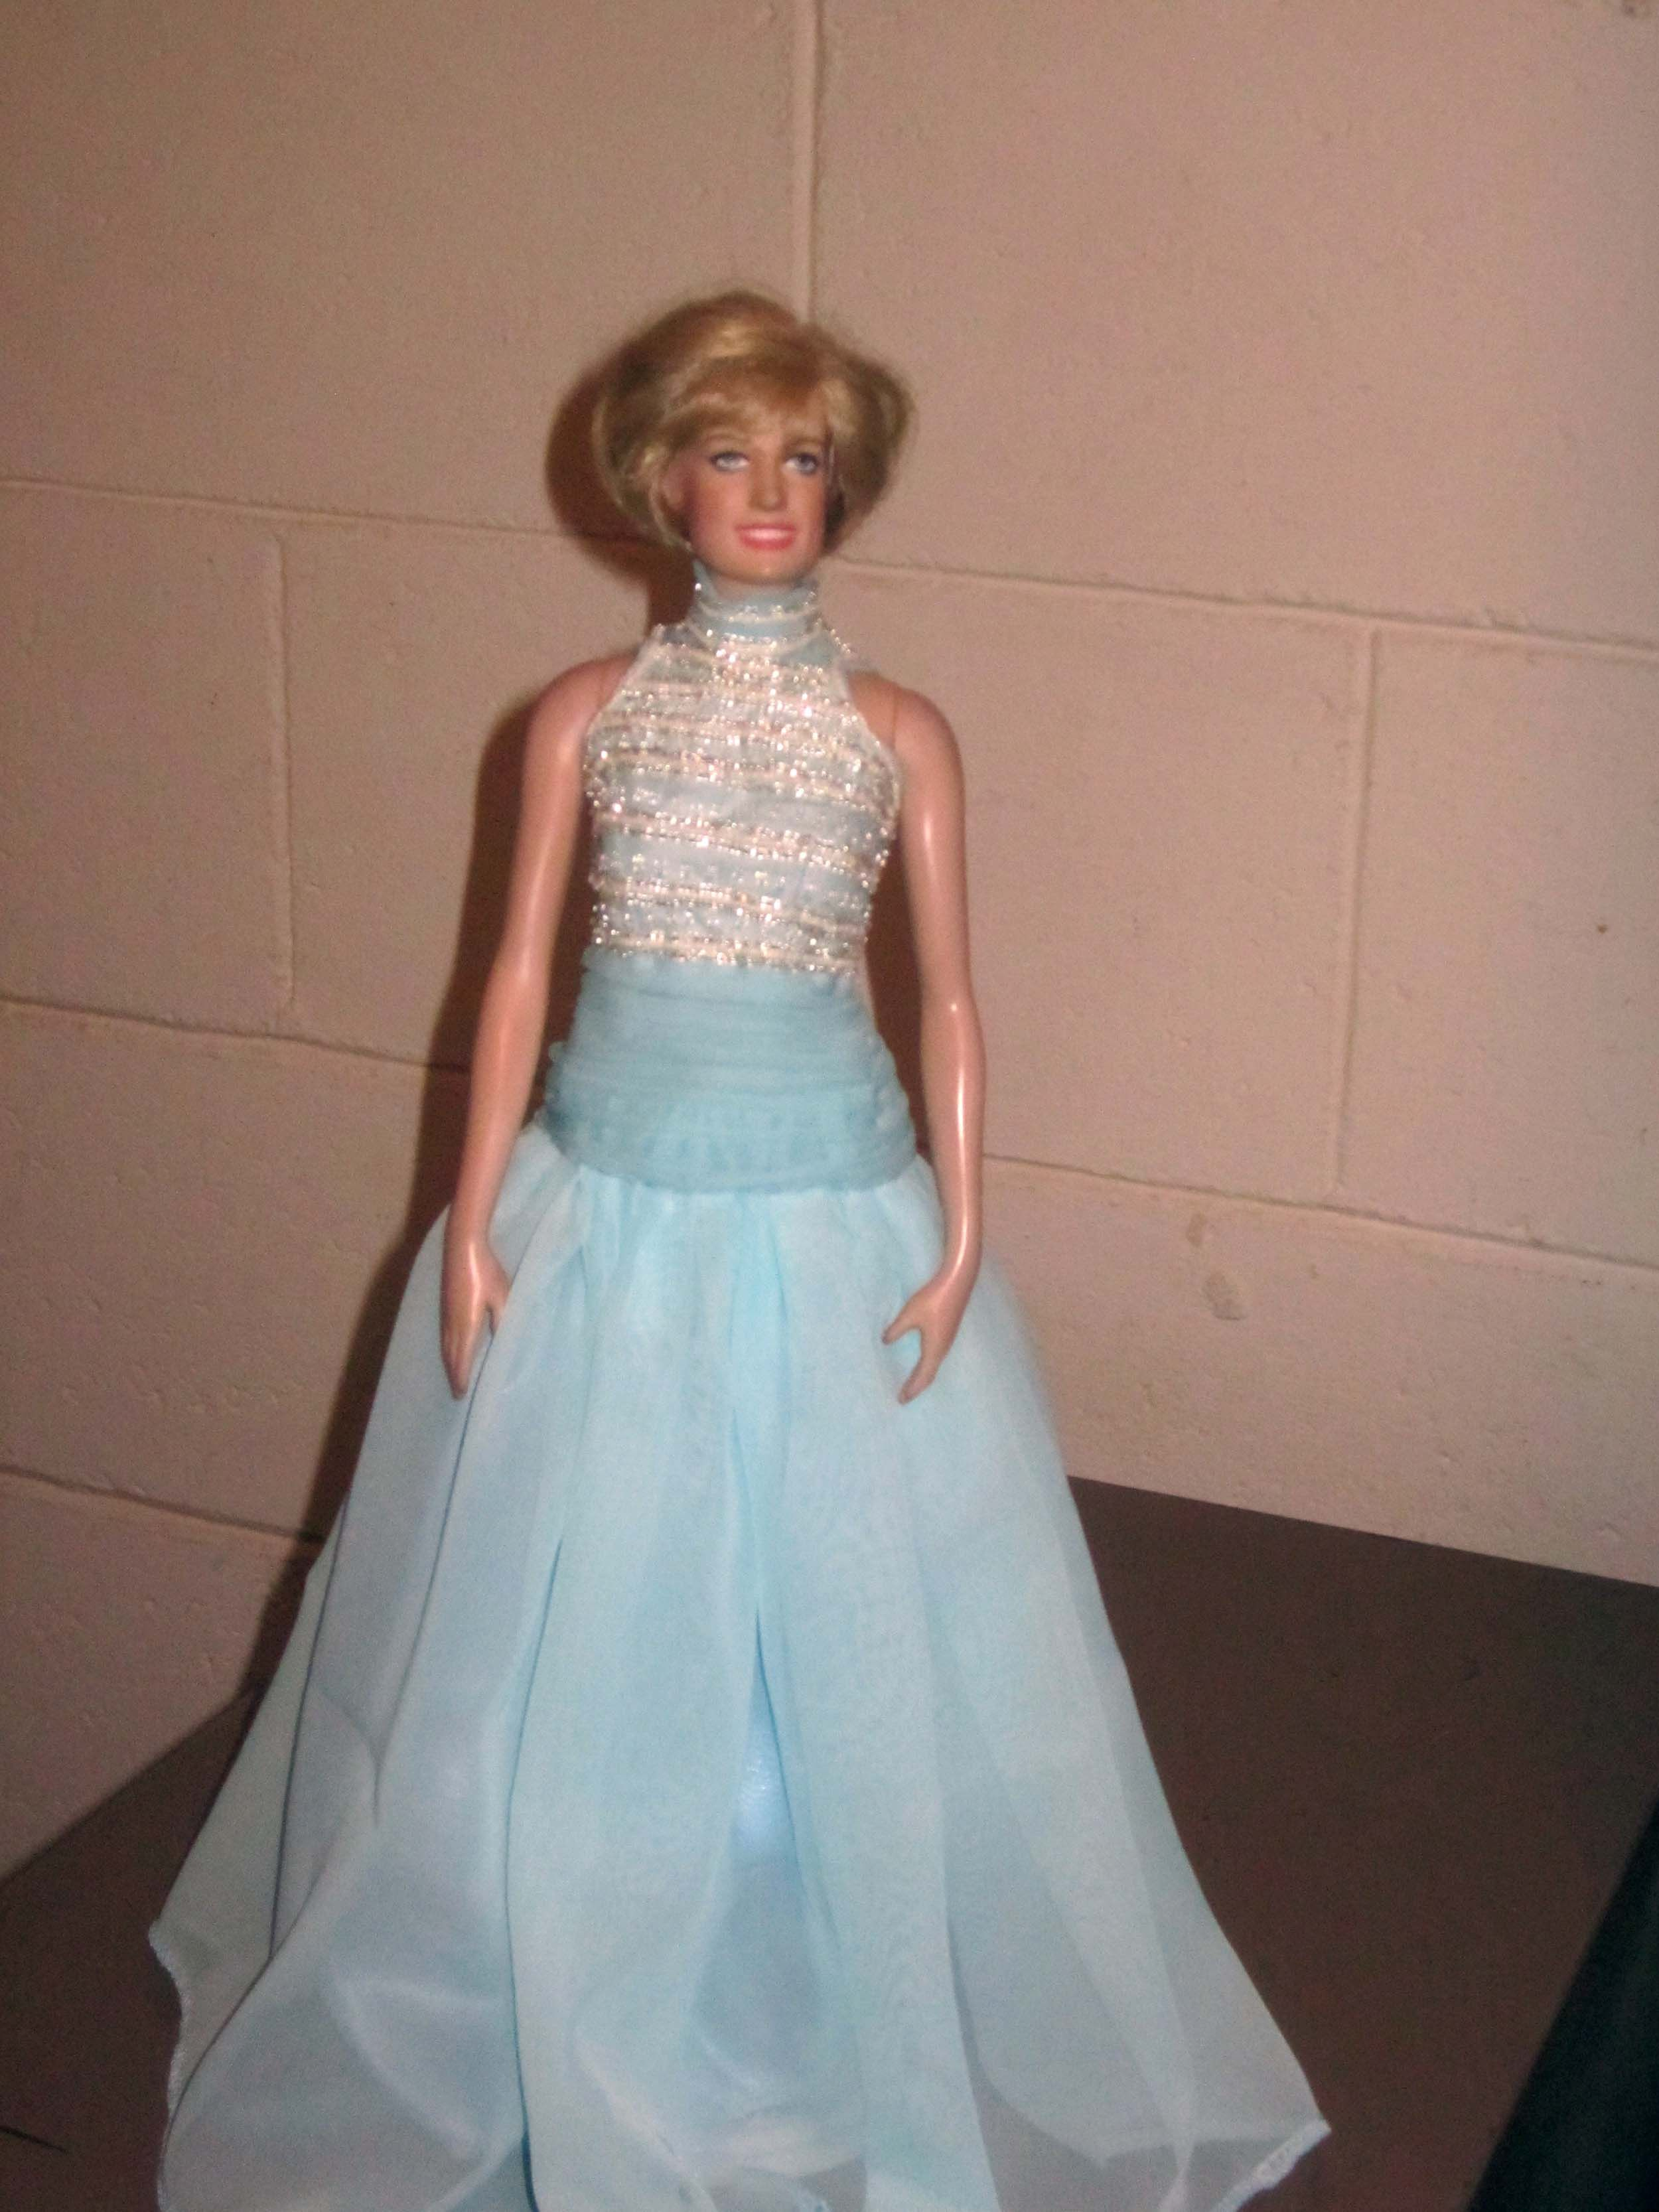 Luxury Princess Diana Wedding Gown Inspiration - All Wedding Dresses ...